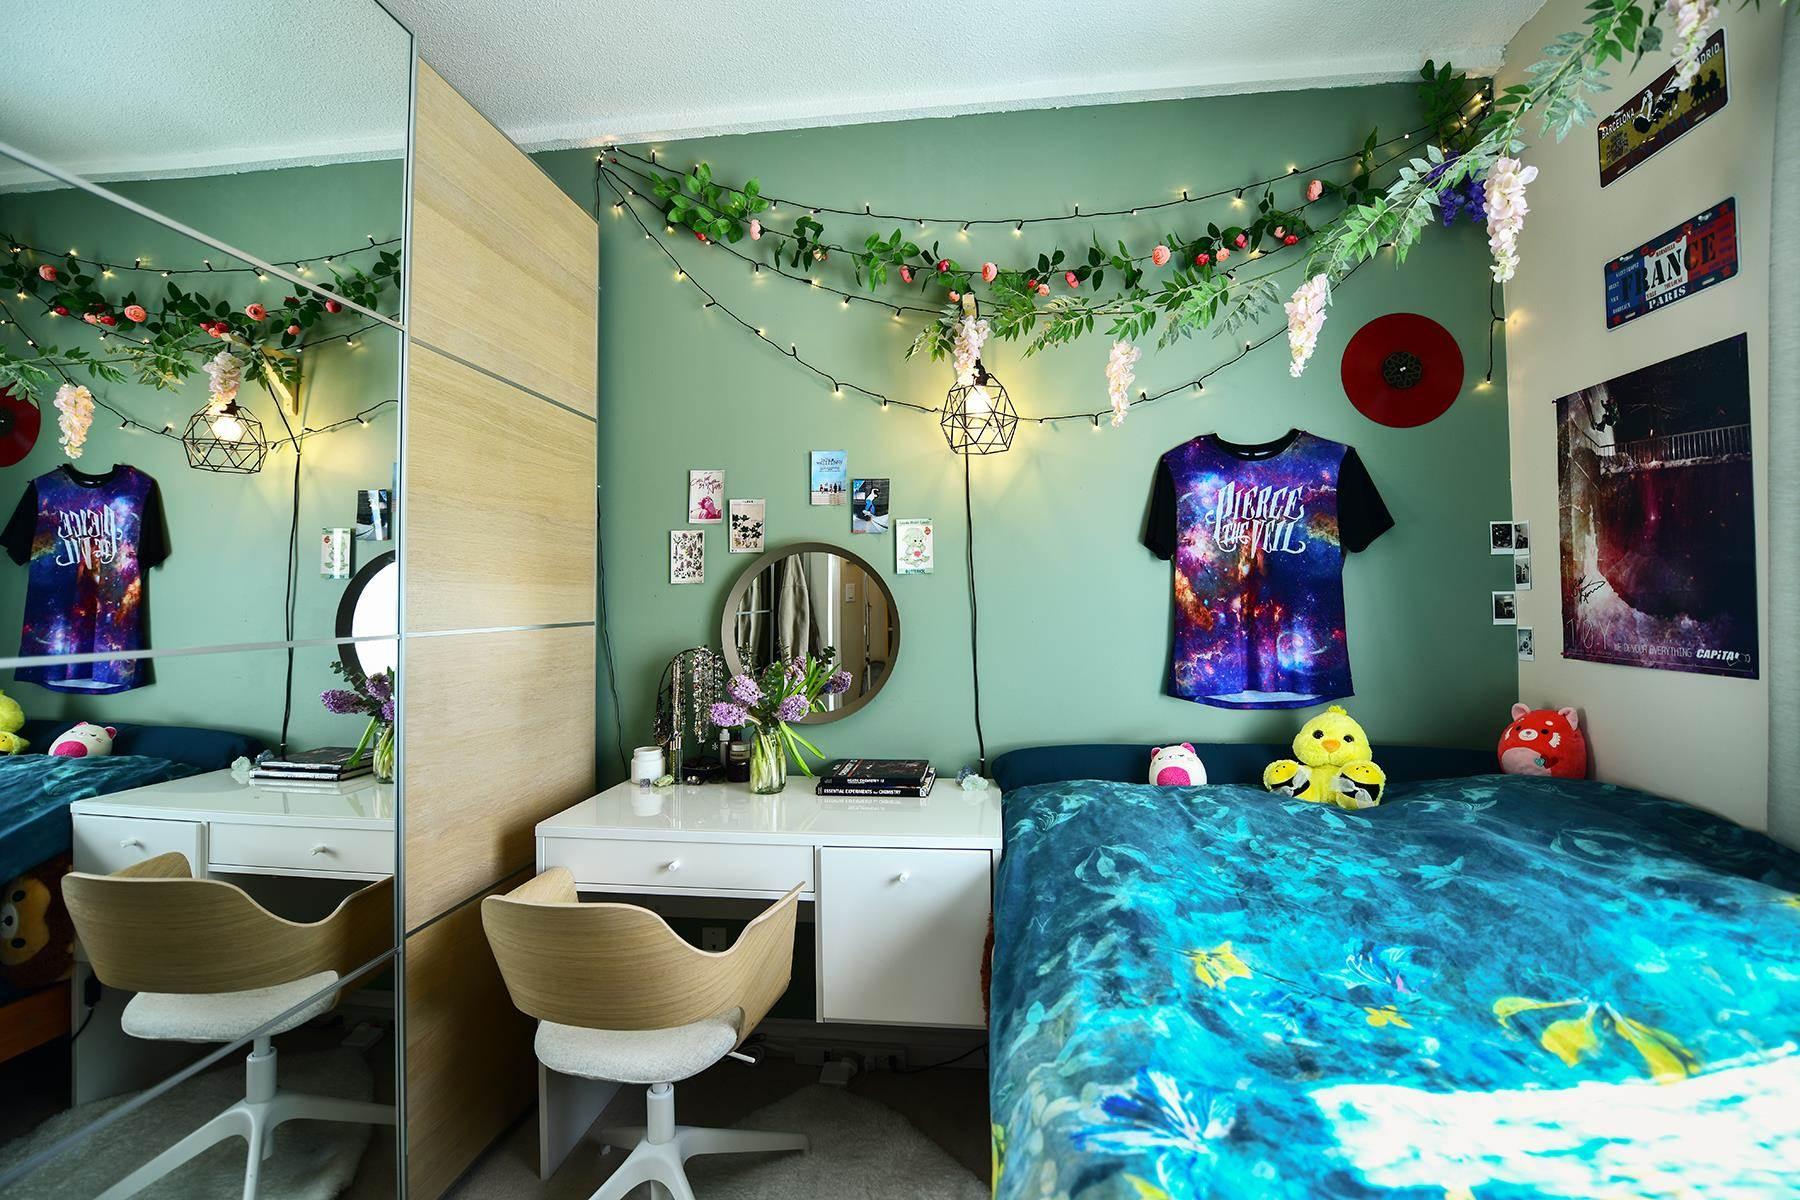 204 5790 EAST BOULEVARD - Kerrisdale Apartment/Condo for sale, 3 Bedrooms (R2604138) - #20